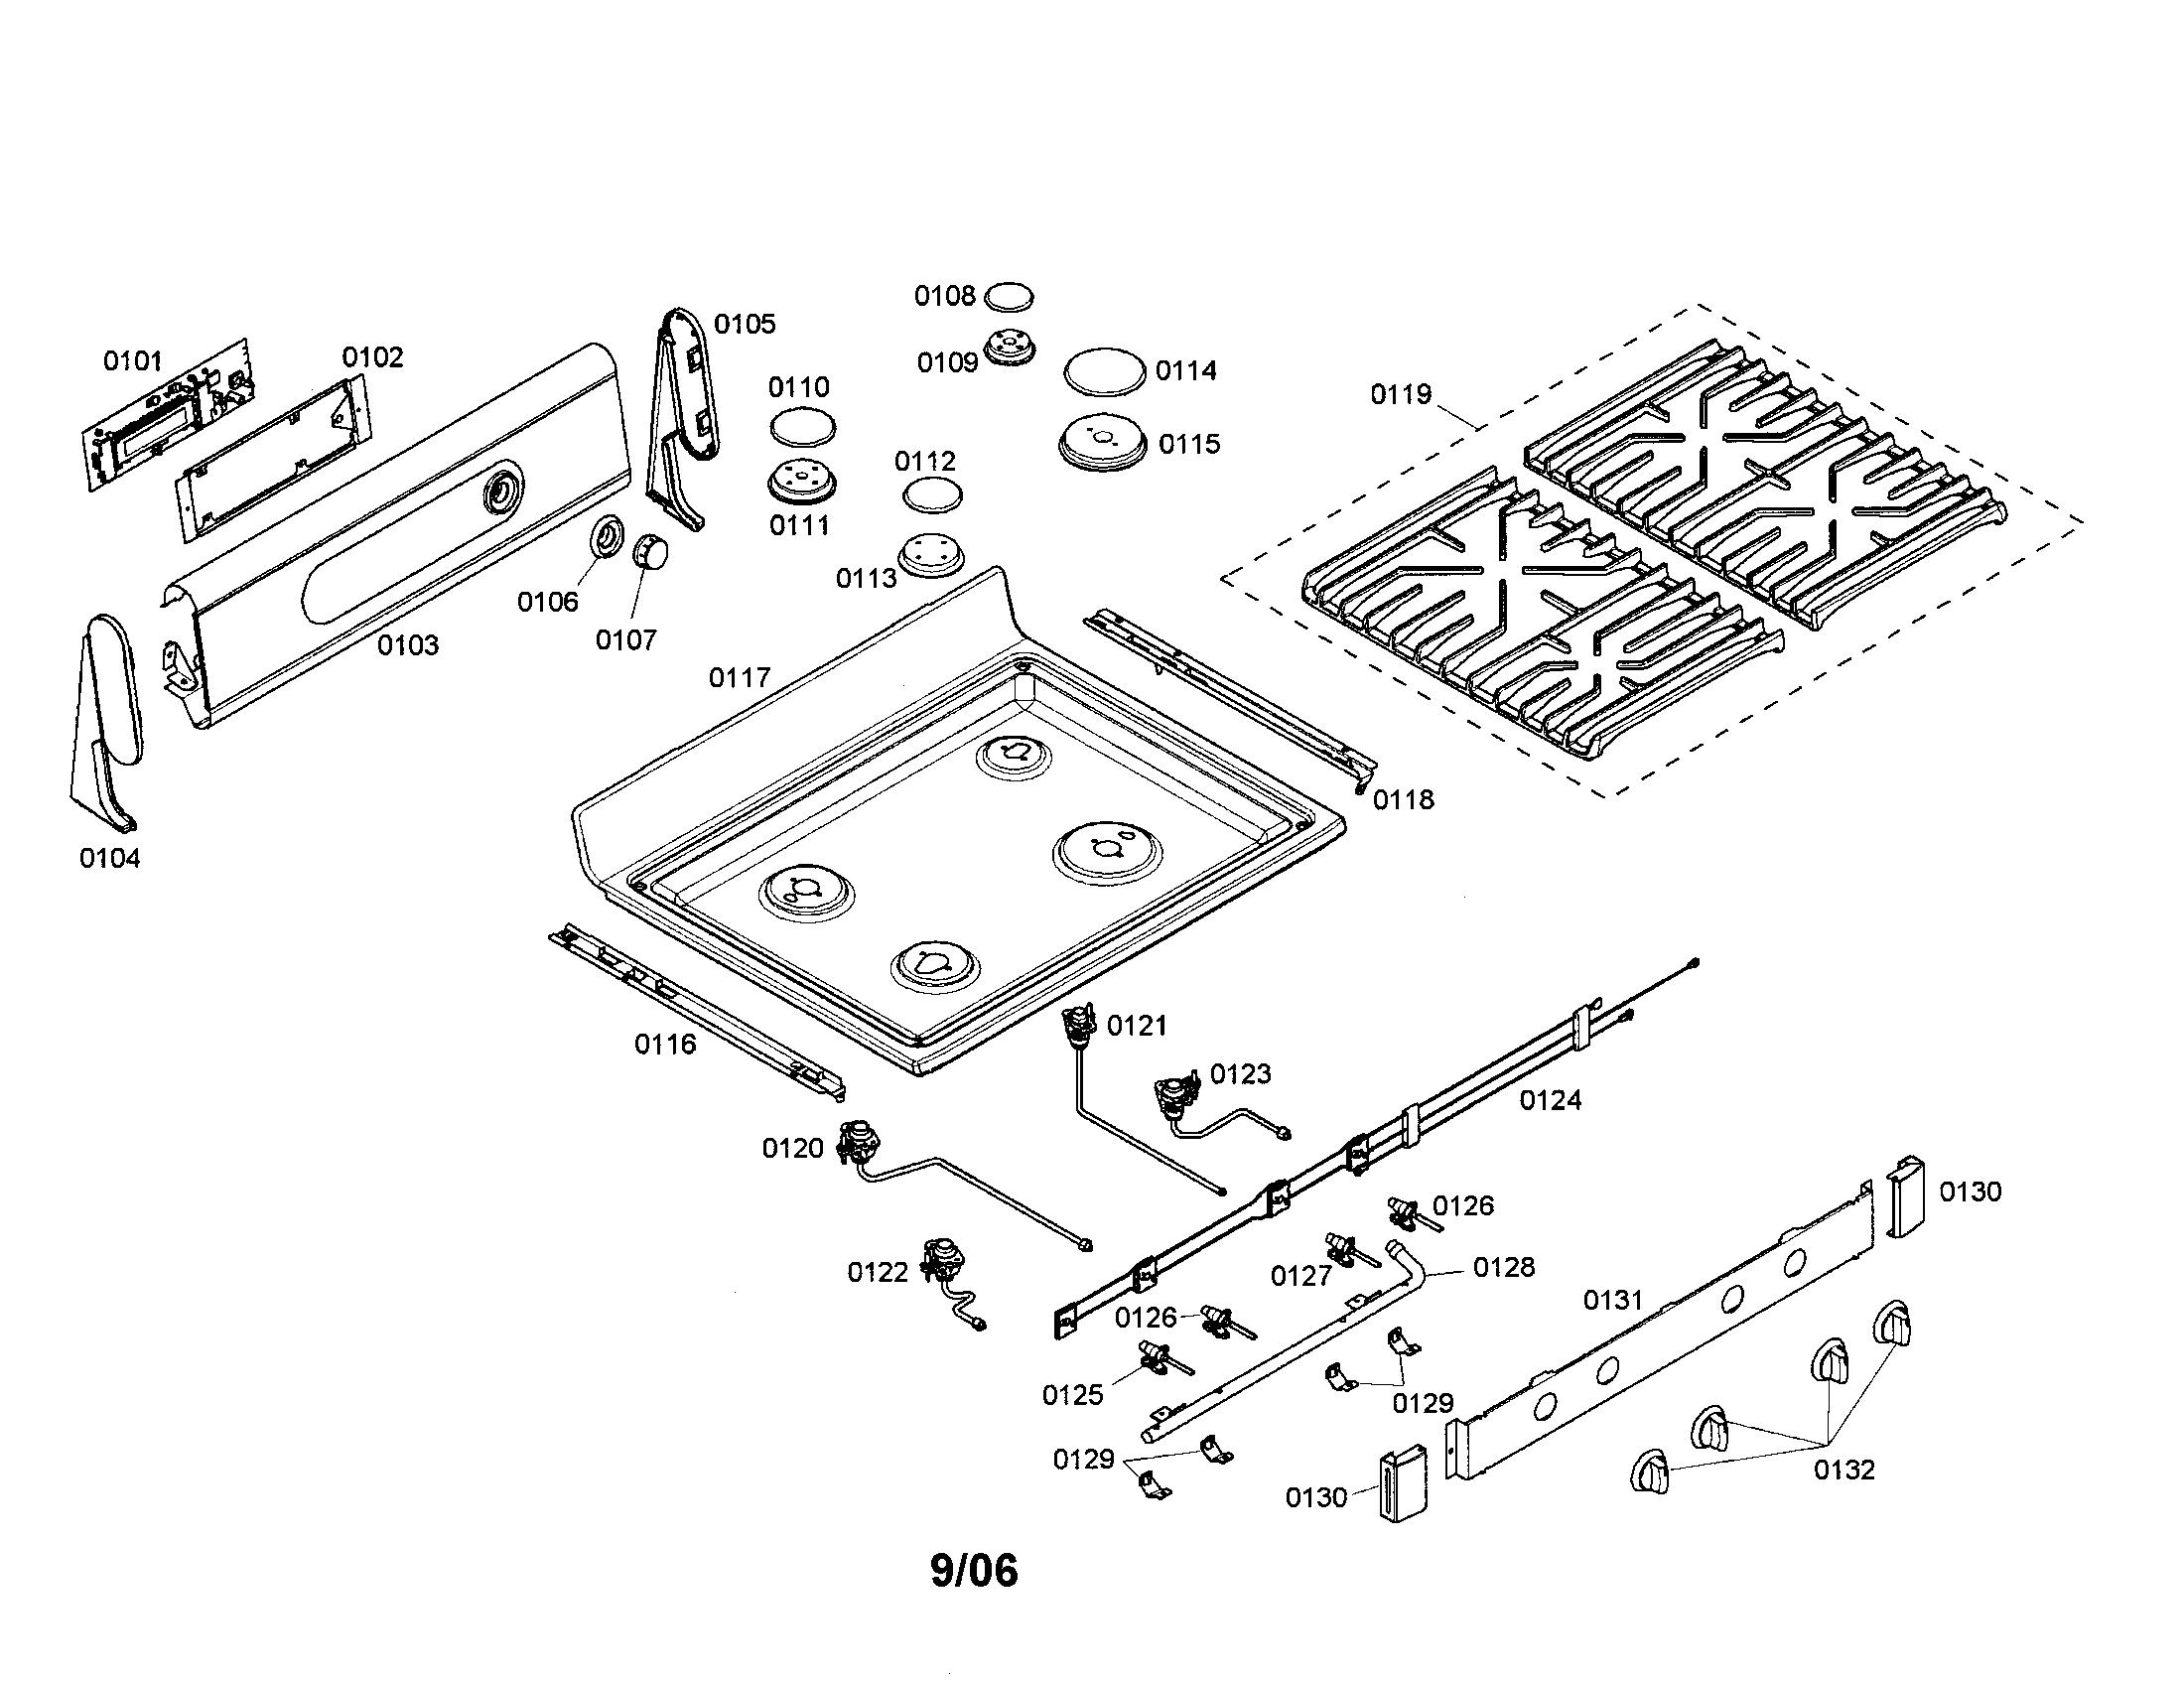 bosch oven wiring diagram minn kota fortrex 80 parts gas range model hgs3052uc01 sears partsdirect